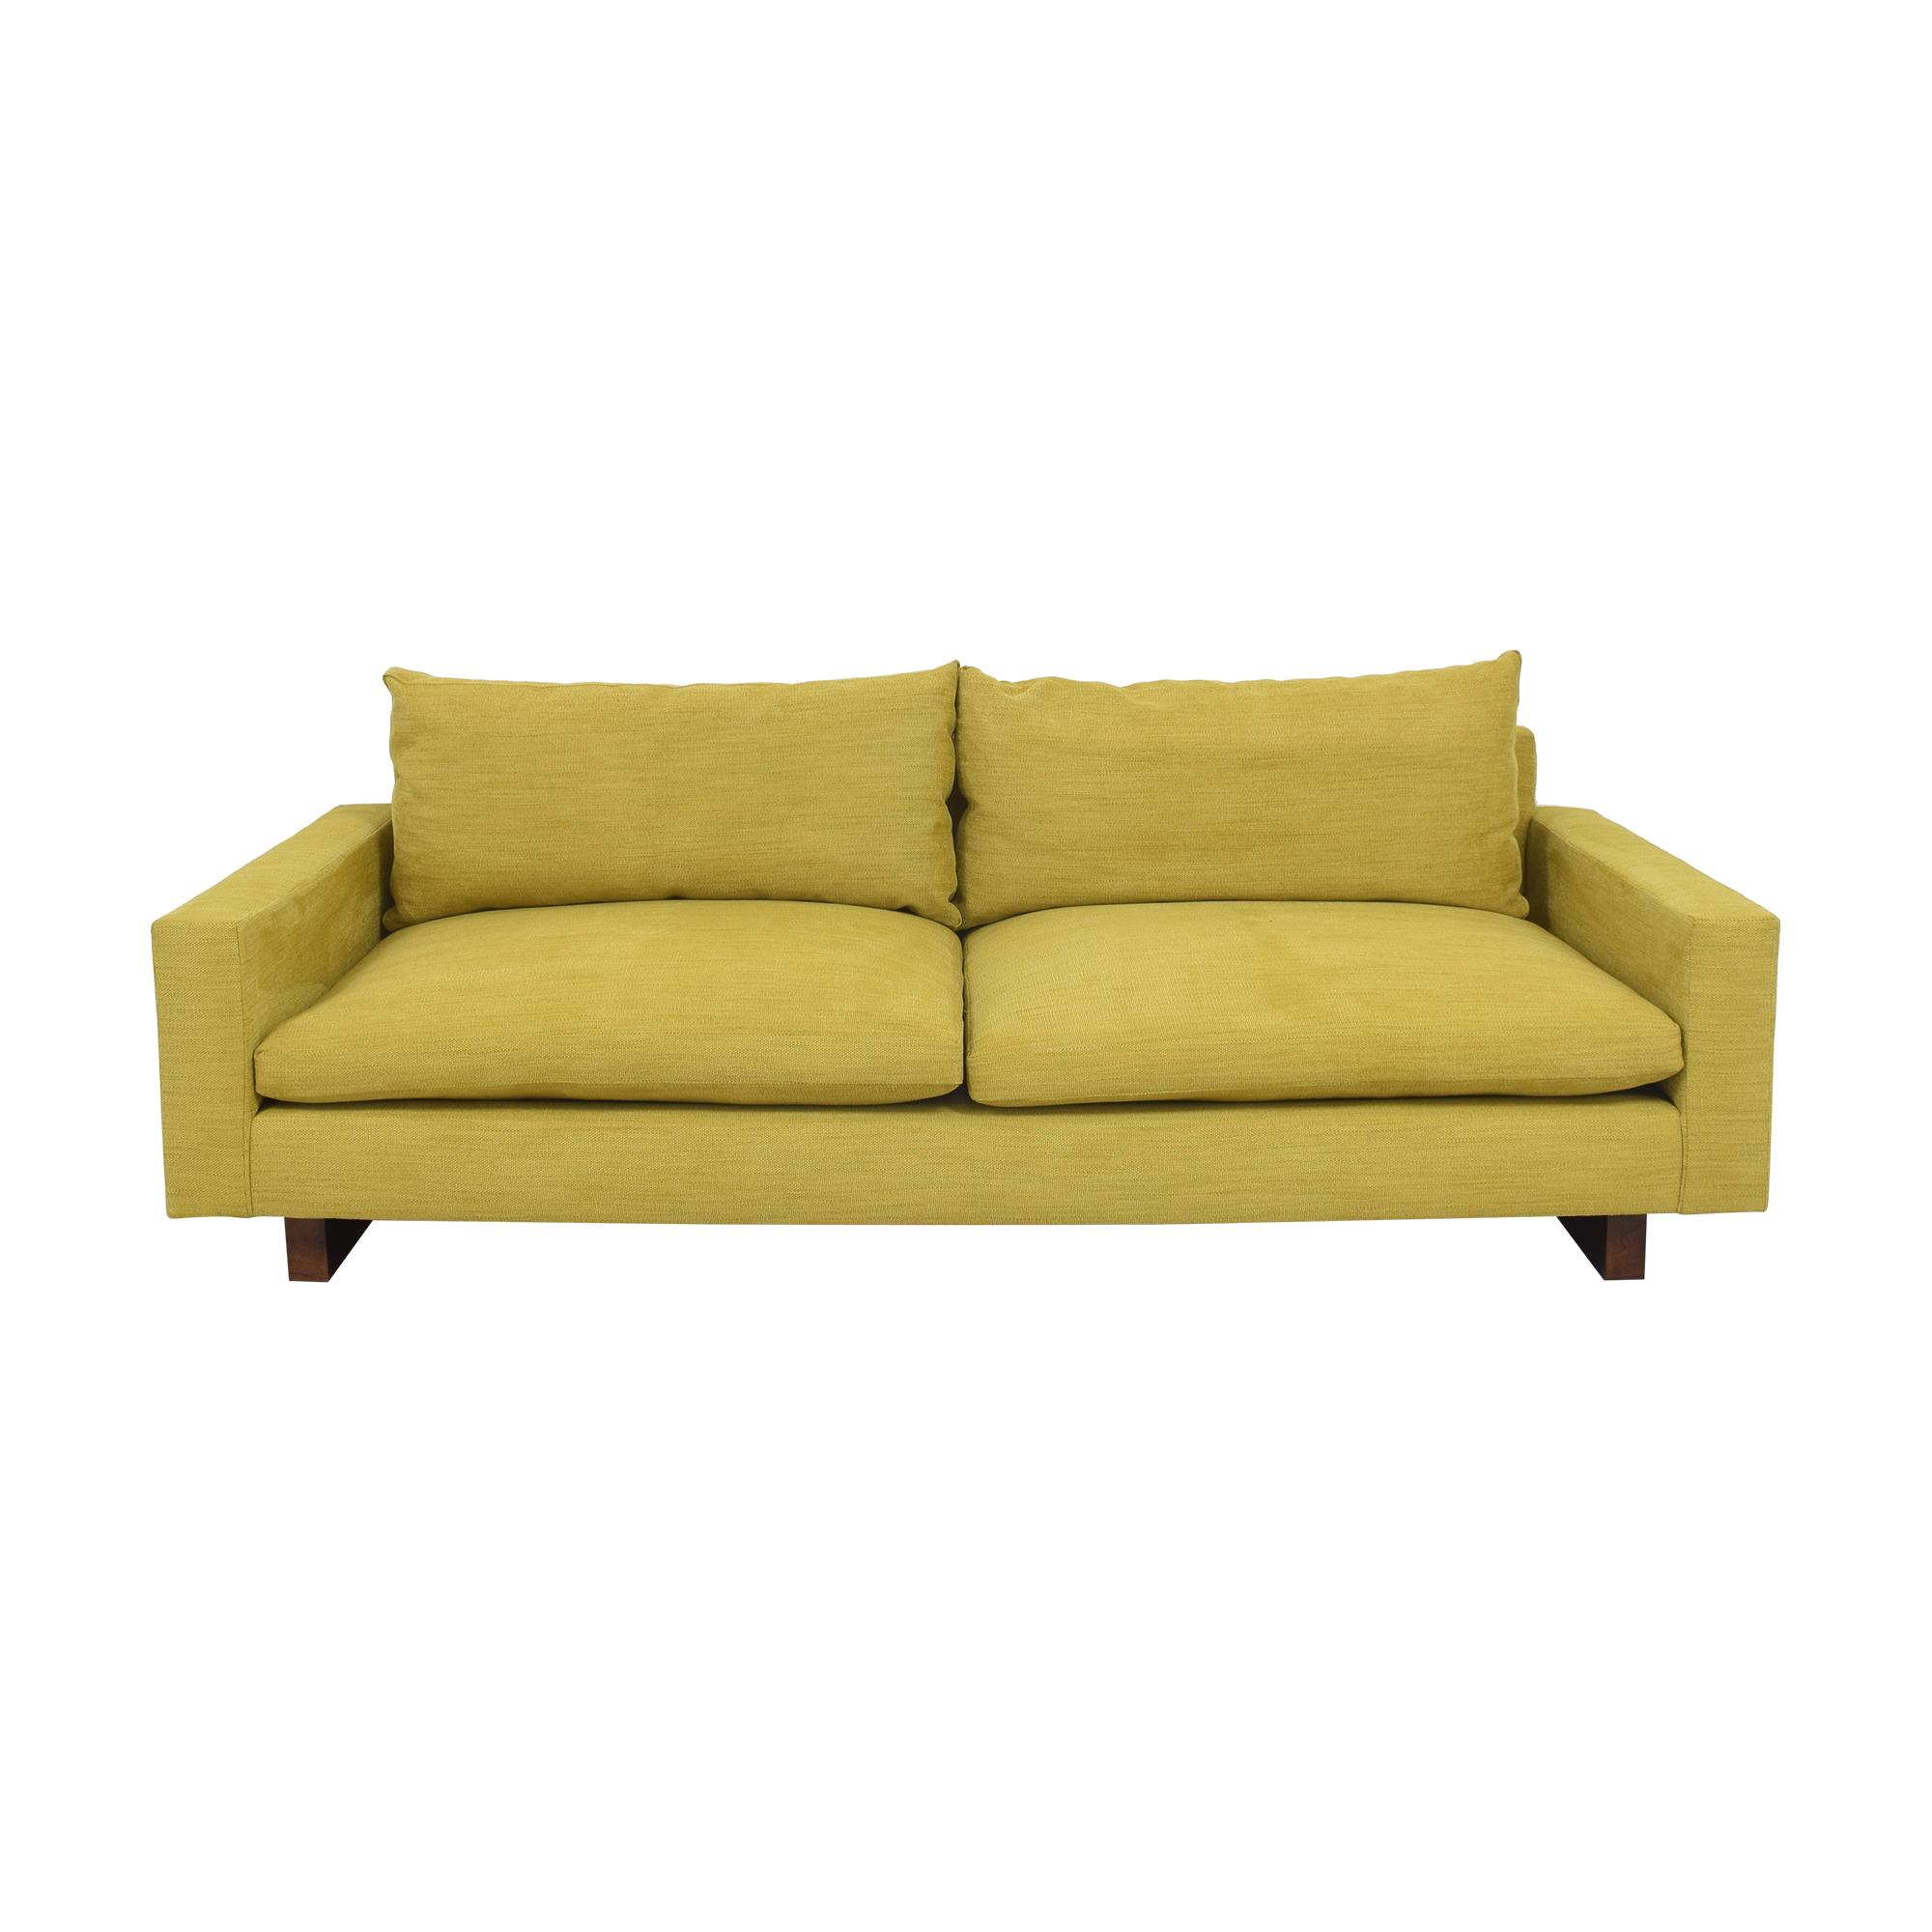 West Elm West Elm Harmony Two Cushion Sofa used